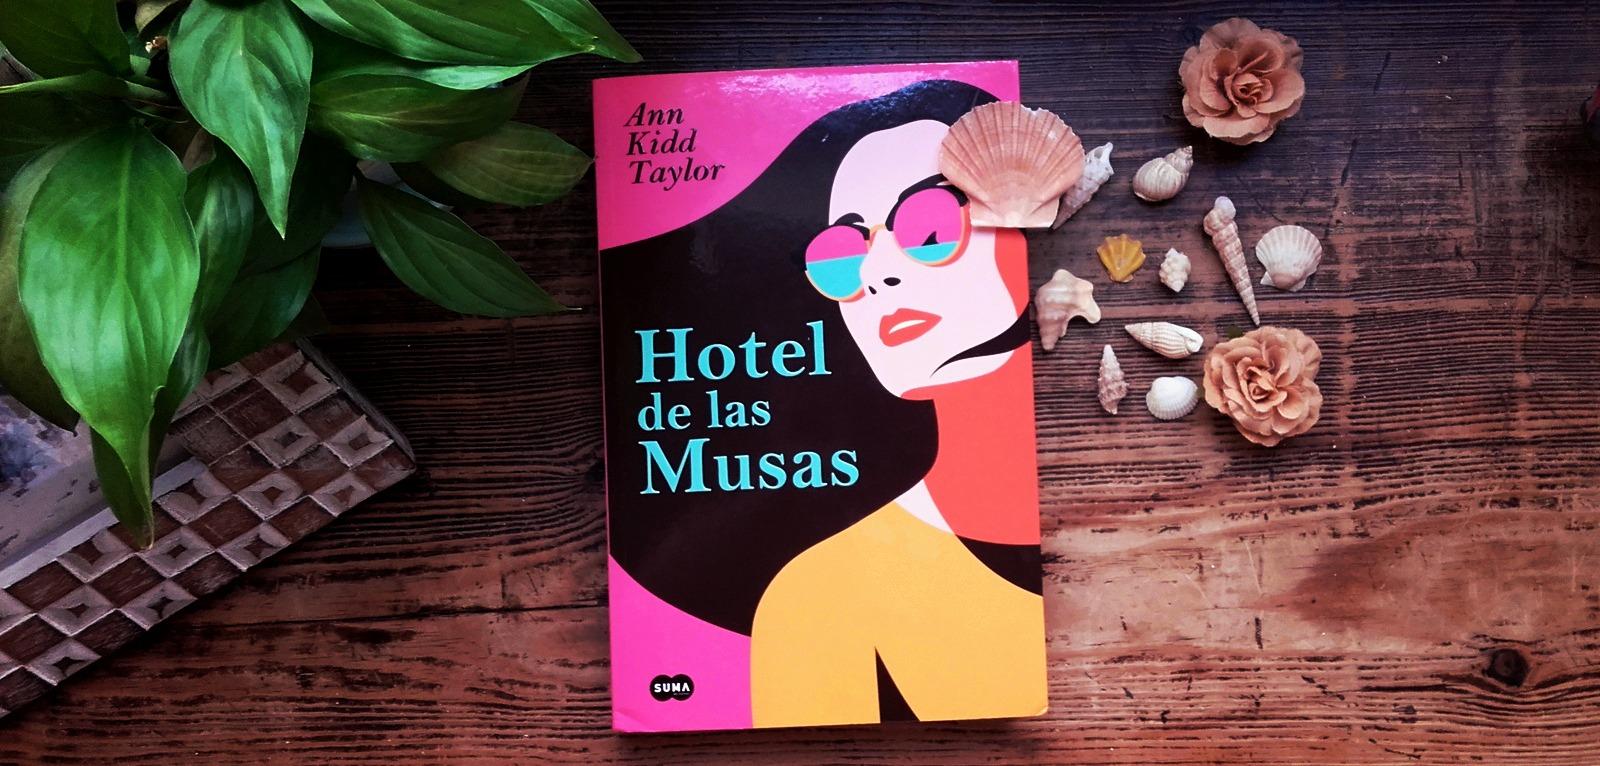 Hotel de las Musas · Ann Kidd Taylor